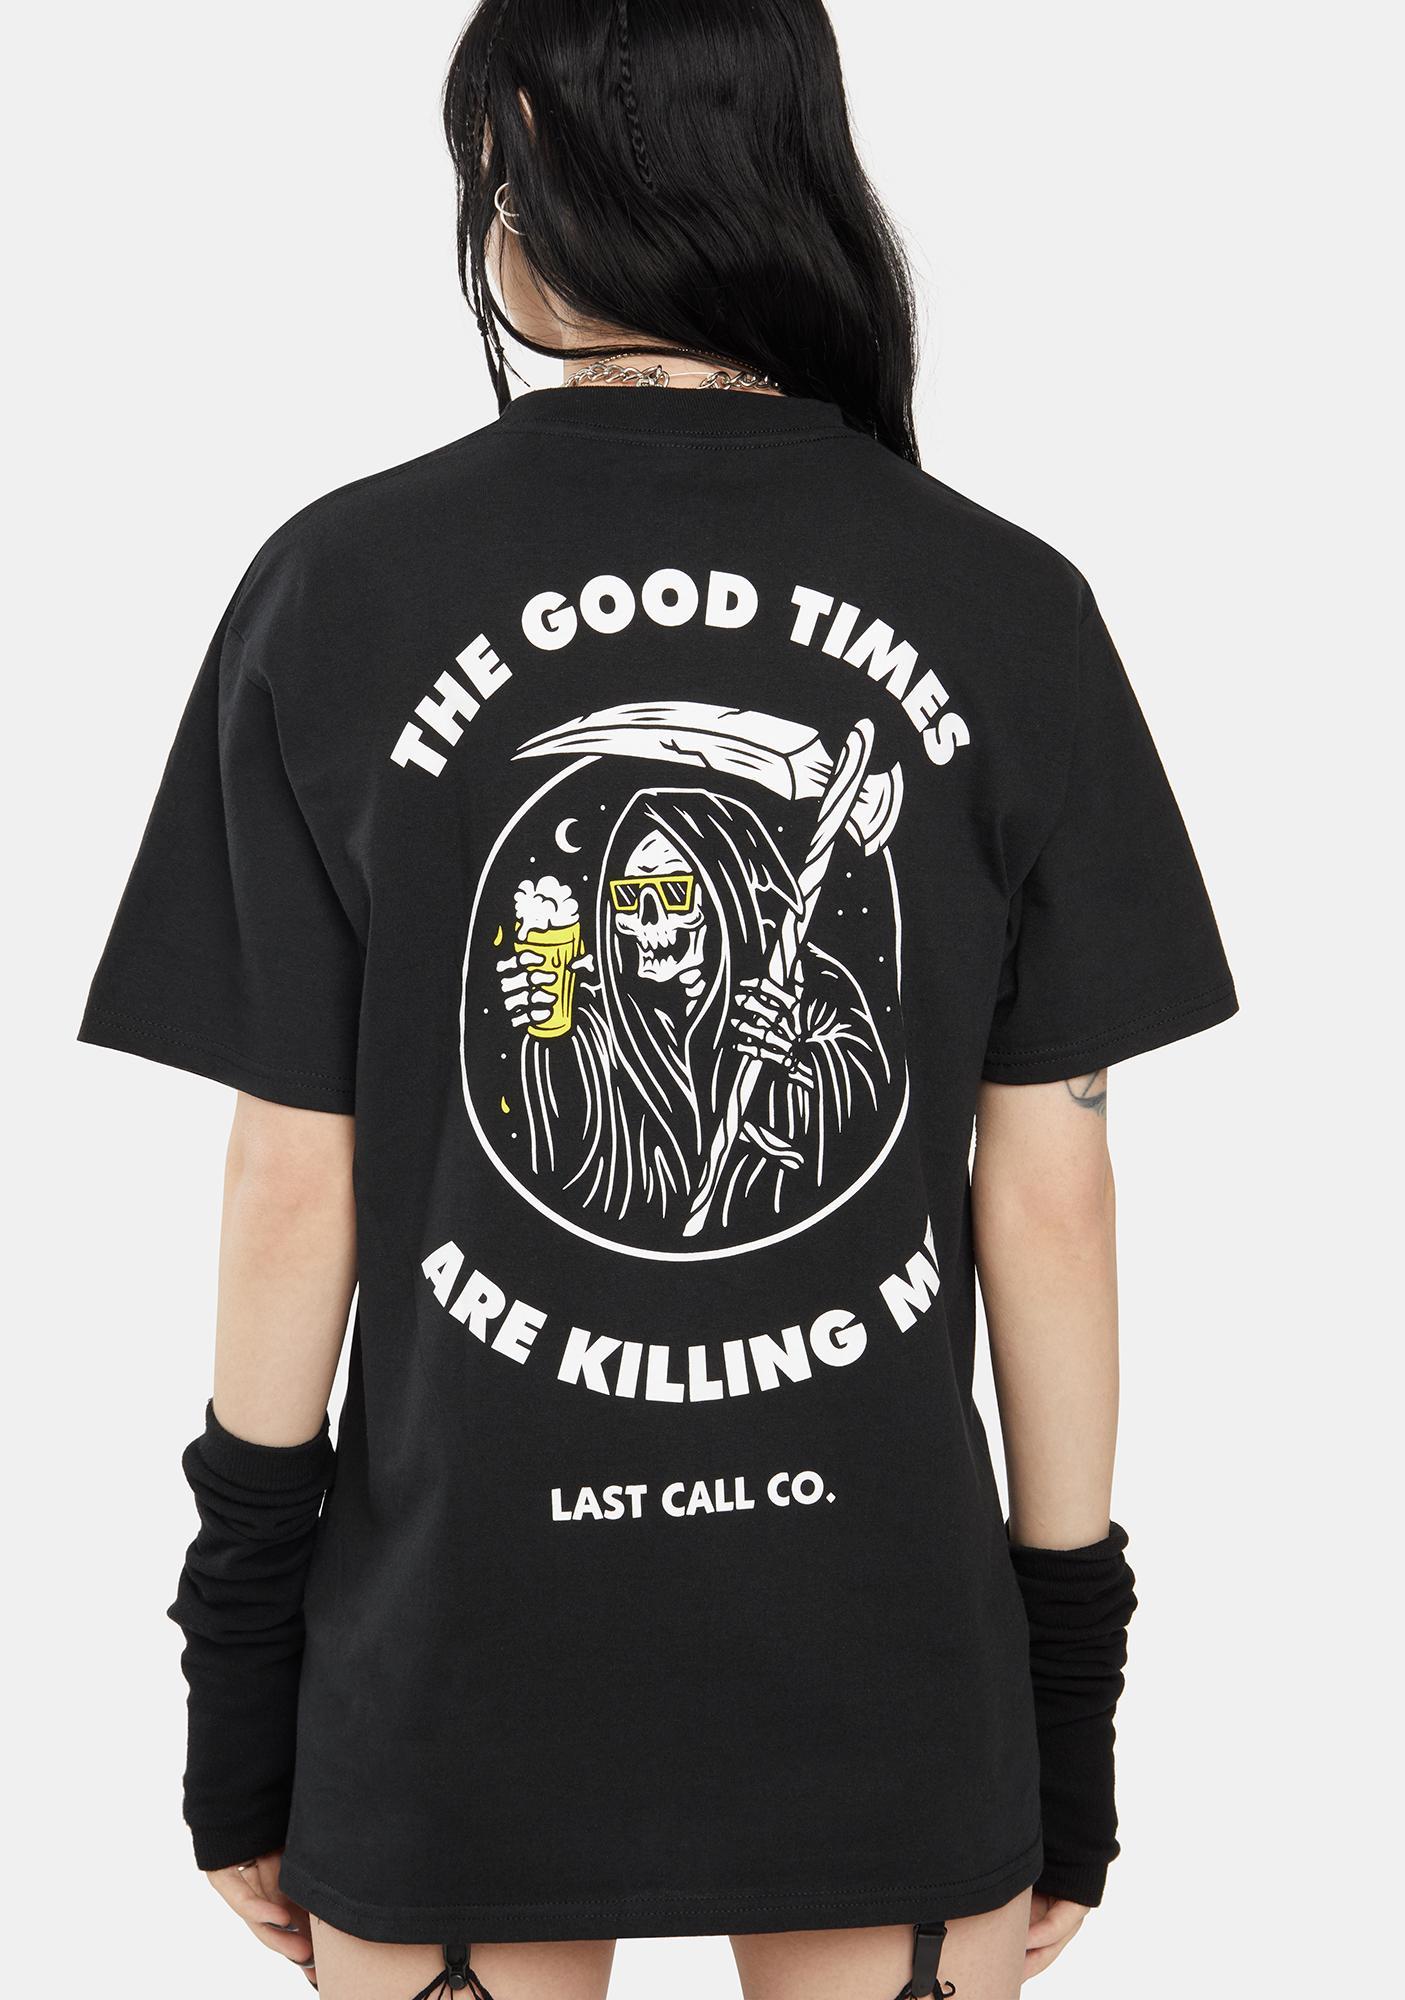 Last Call Co. Killing Me Graphic Tee